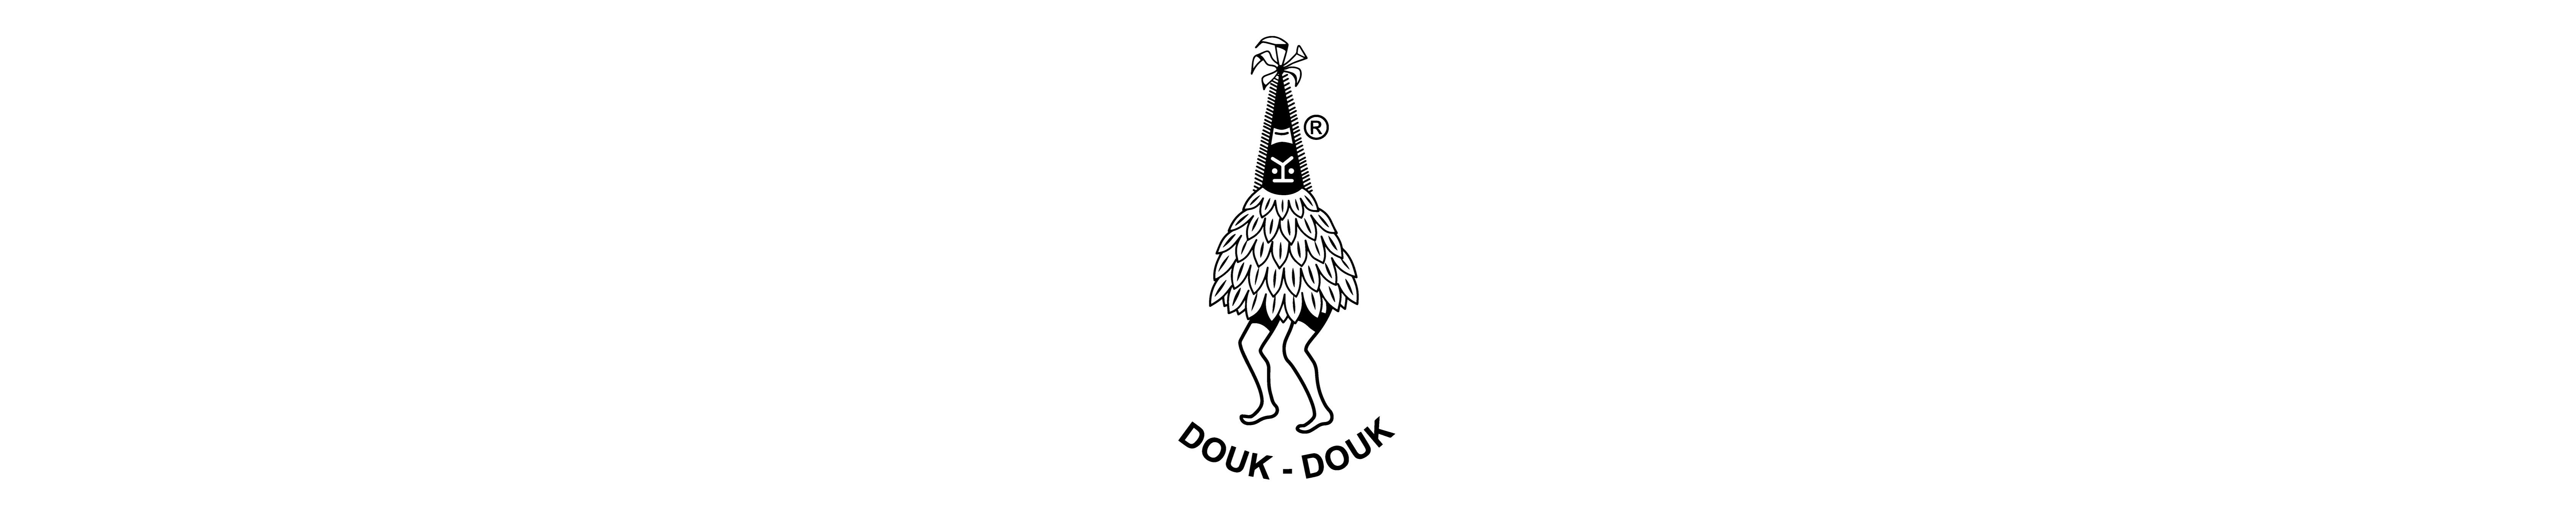 Douk-Douk